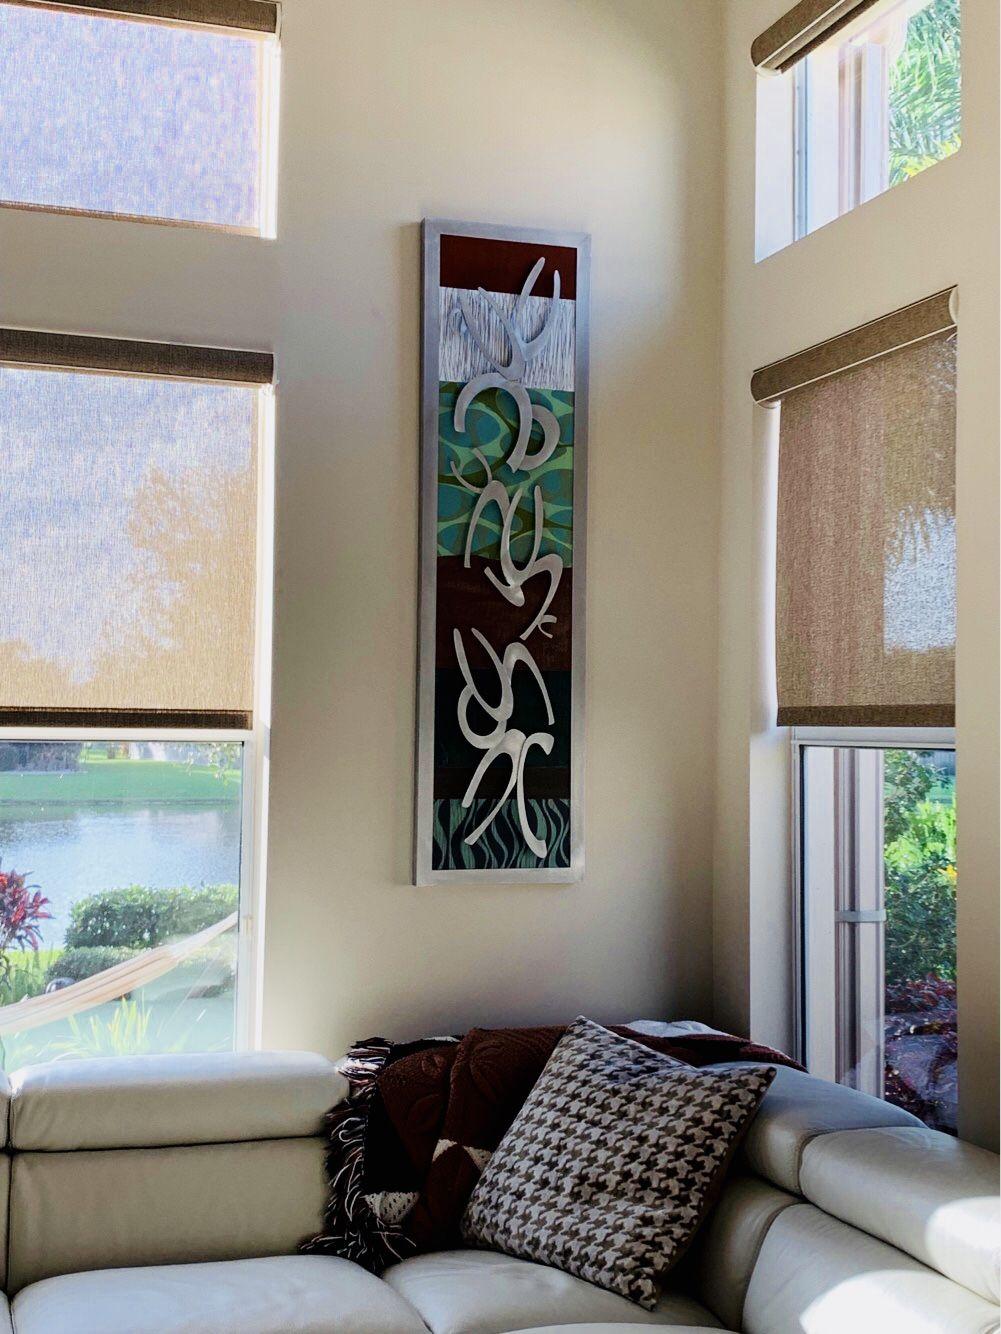 Metal Wall Art On A Narrow Wall With Tall Ceilings Metalwallart Longnarrowart Metalwalldecor C Modern Wall Sculptures Trendy Wall Art Interior Wall Design